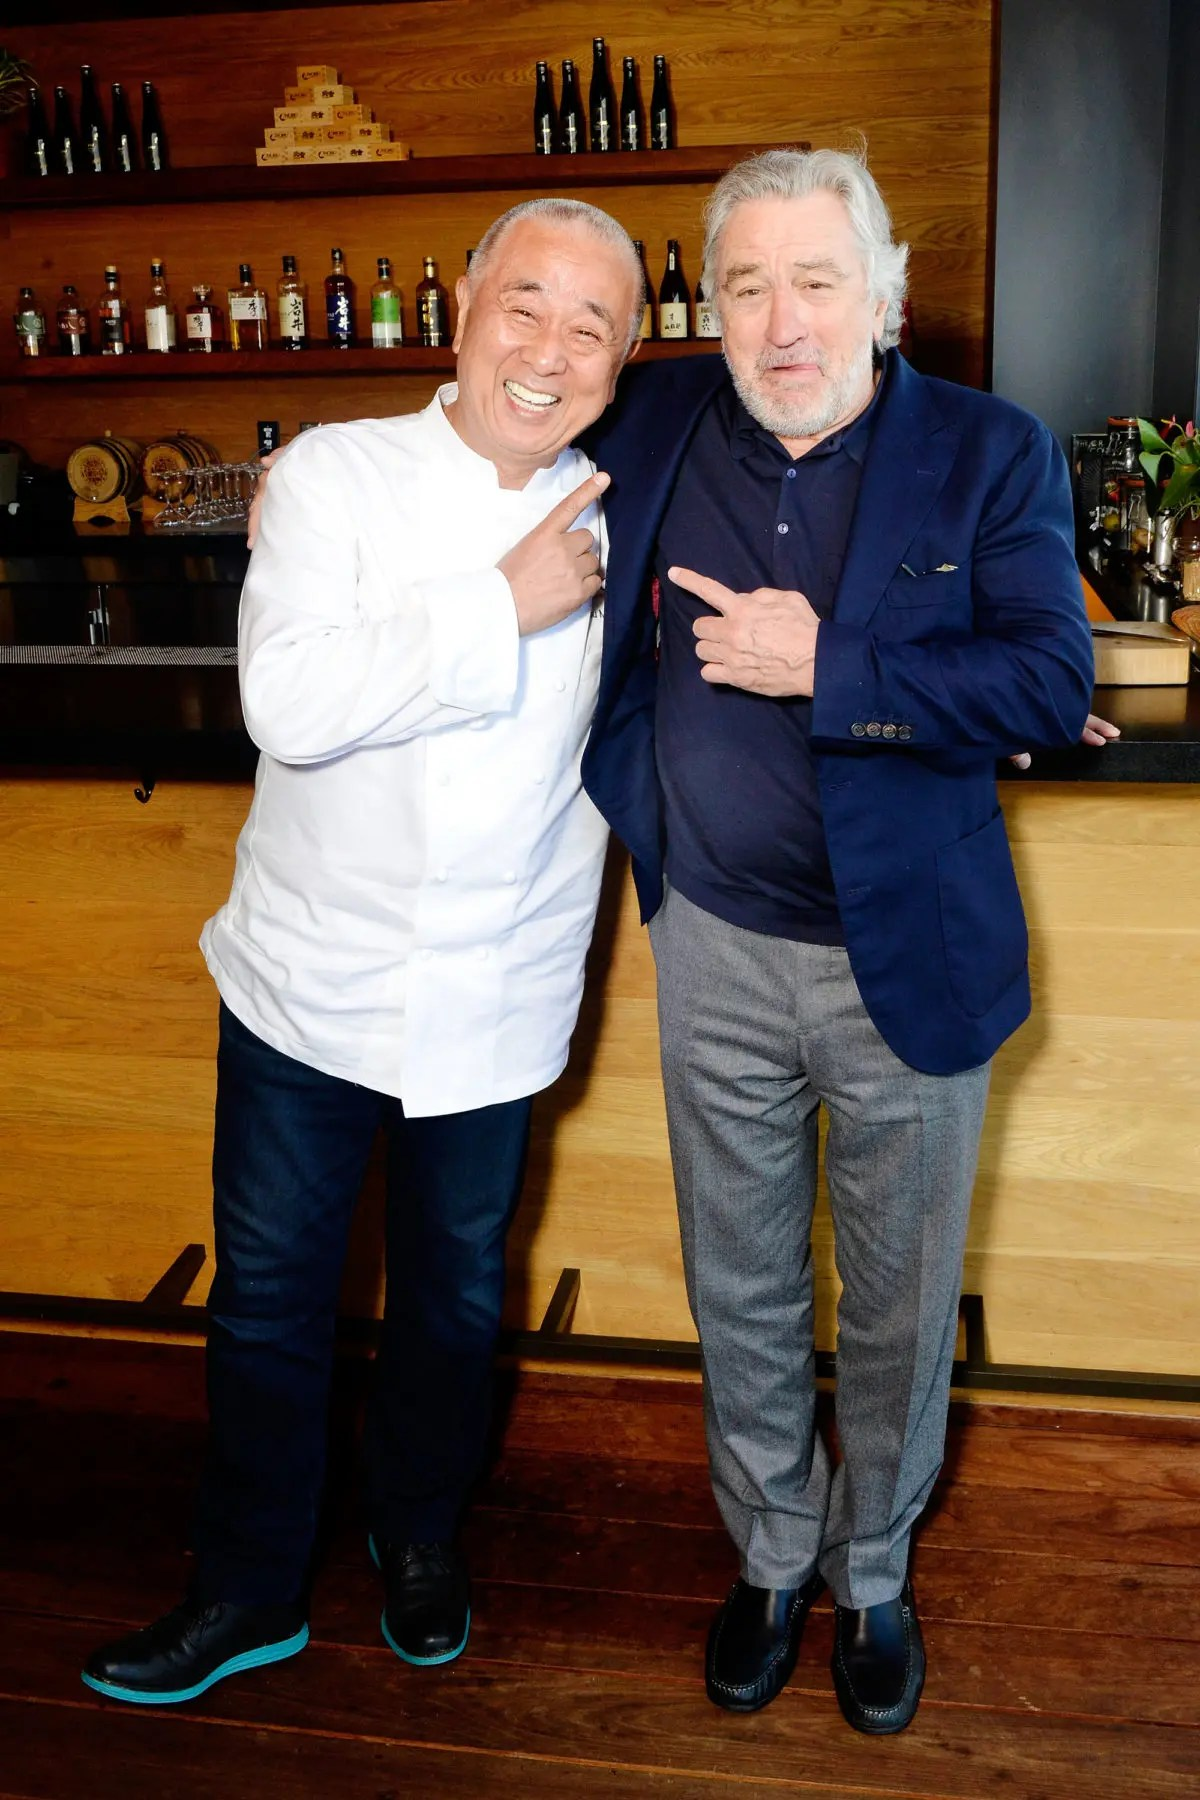 Nobu Matsuhisa and Robert De Niro at the Nobu Newport Beach Grand Cordon Bar